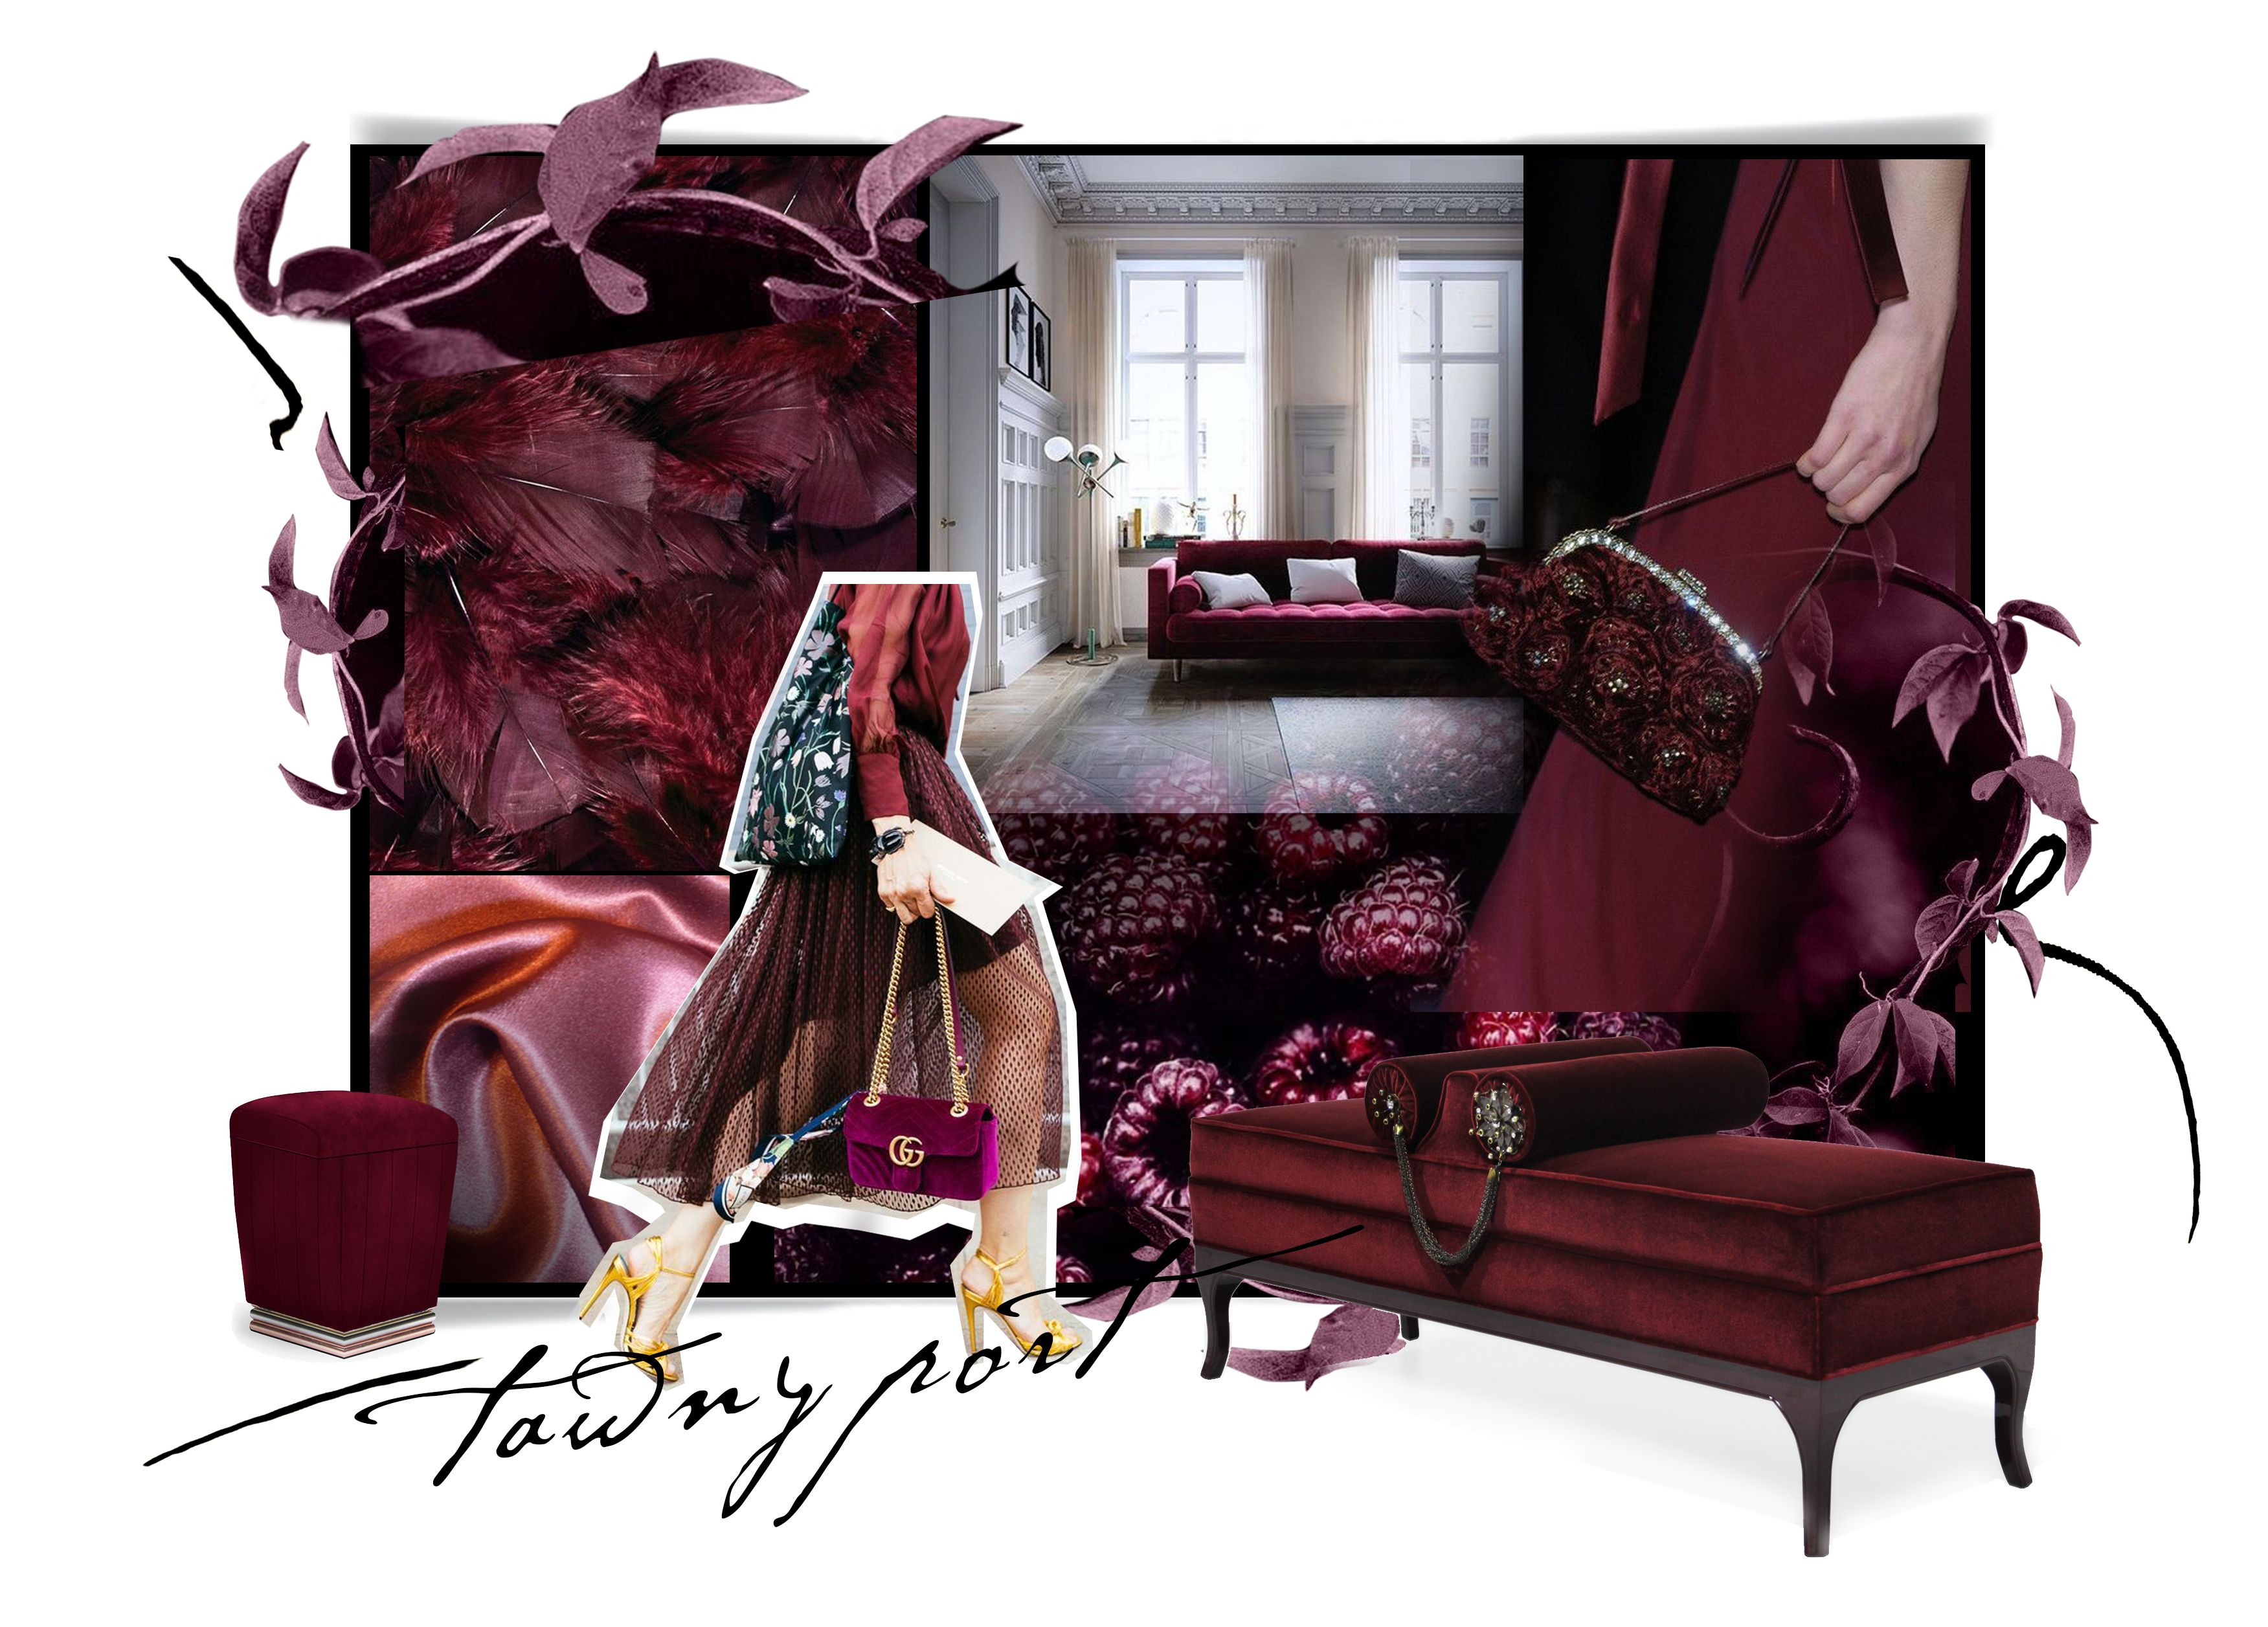 LÉLÉ Bench Bench designs, Design, Luxury interior